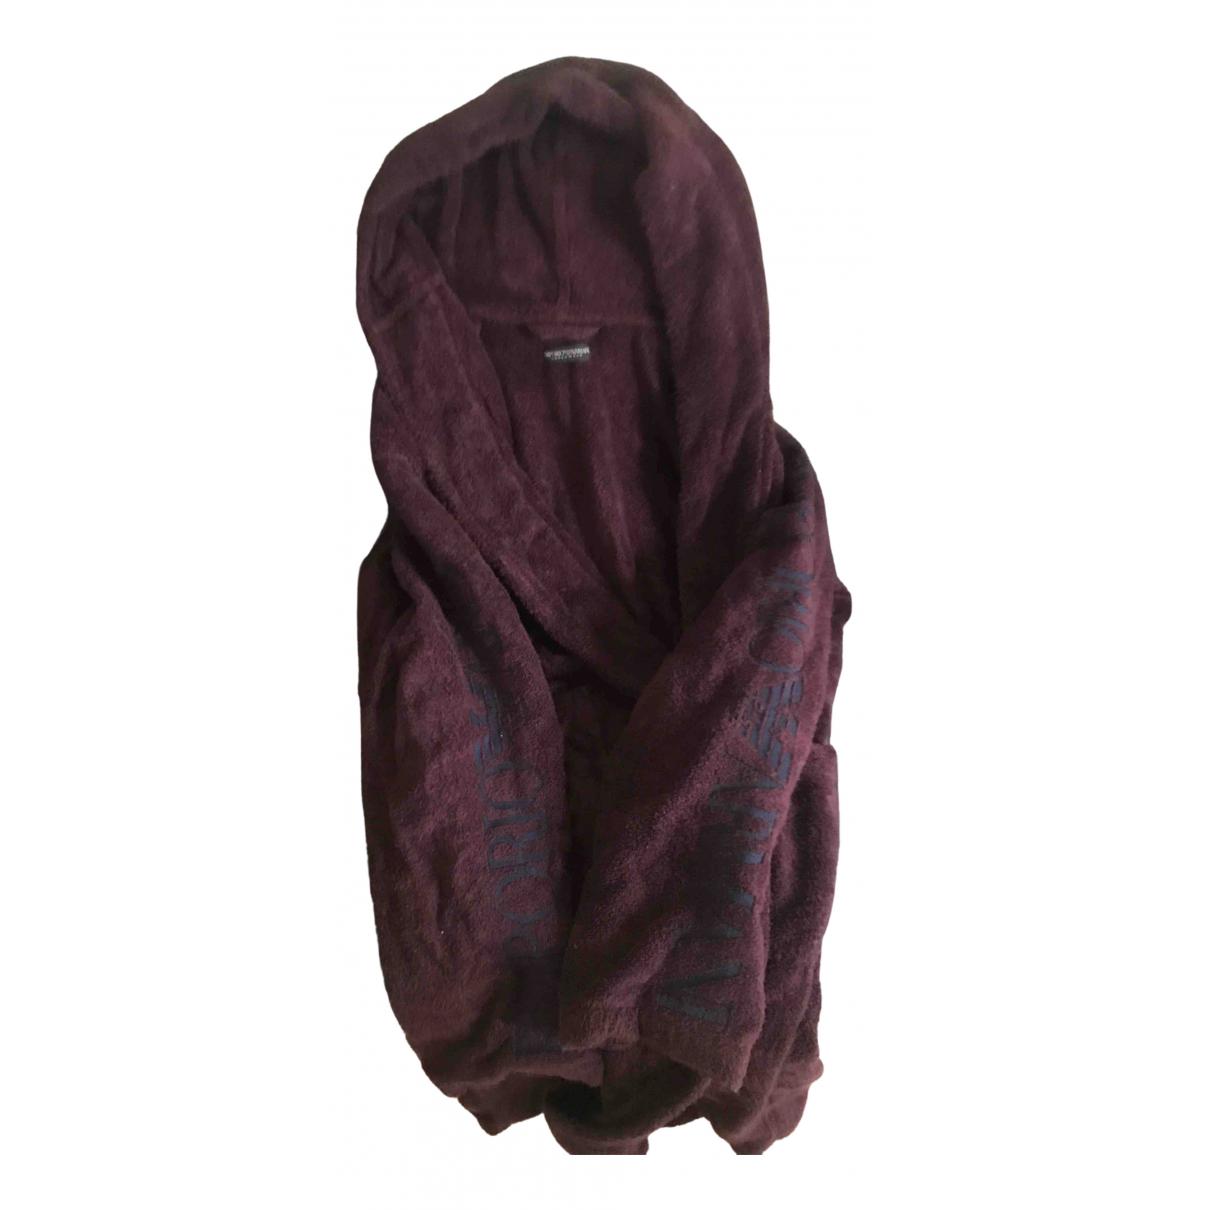 Emporio Armani \N Burgundy Cotton Knitwear & Sweatshirts for Men M International